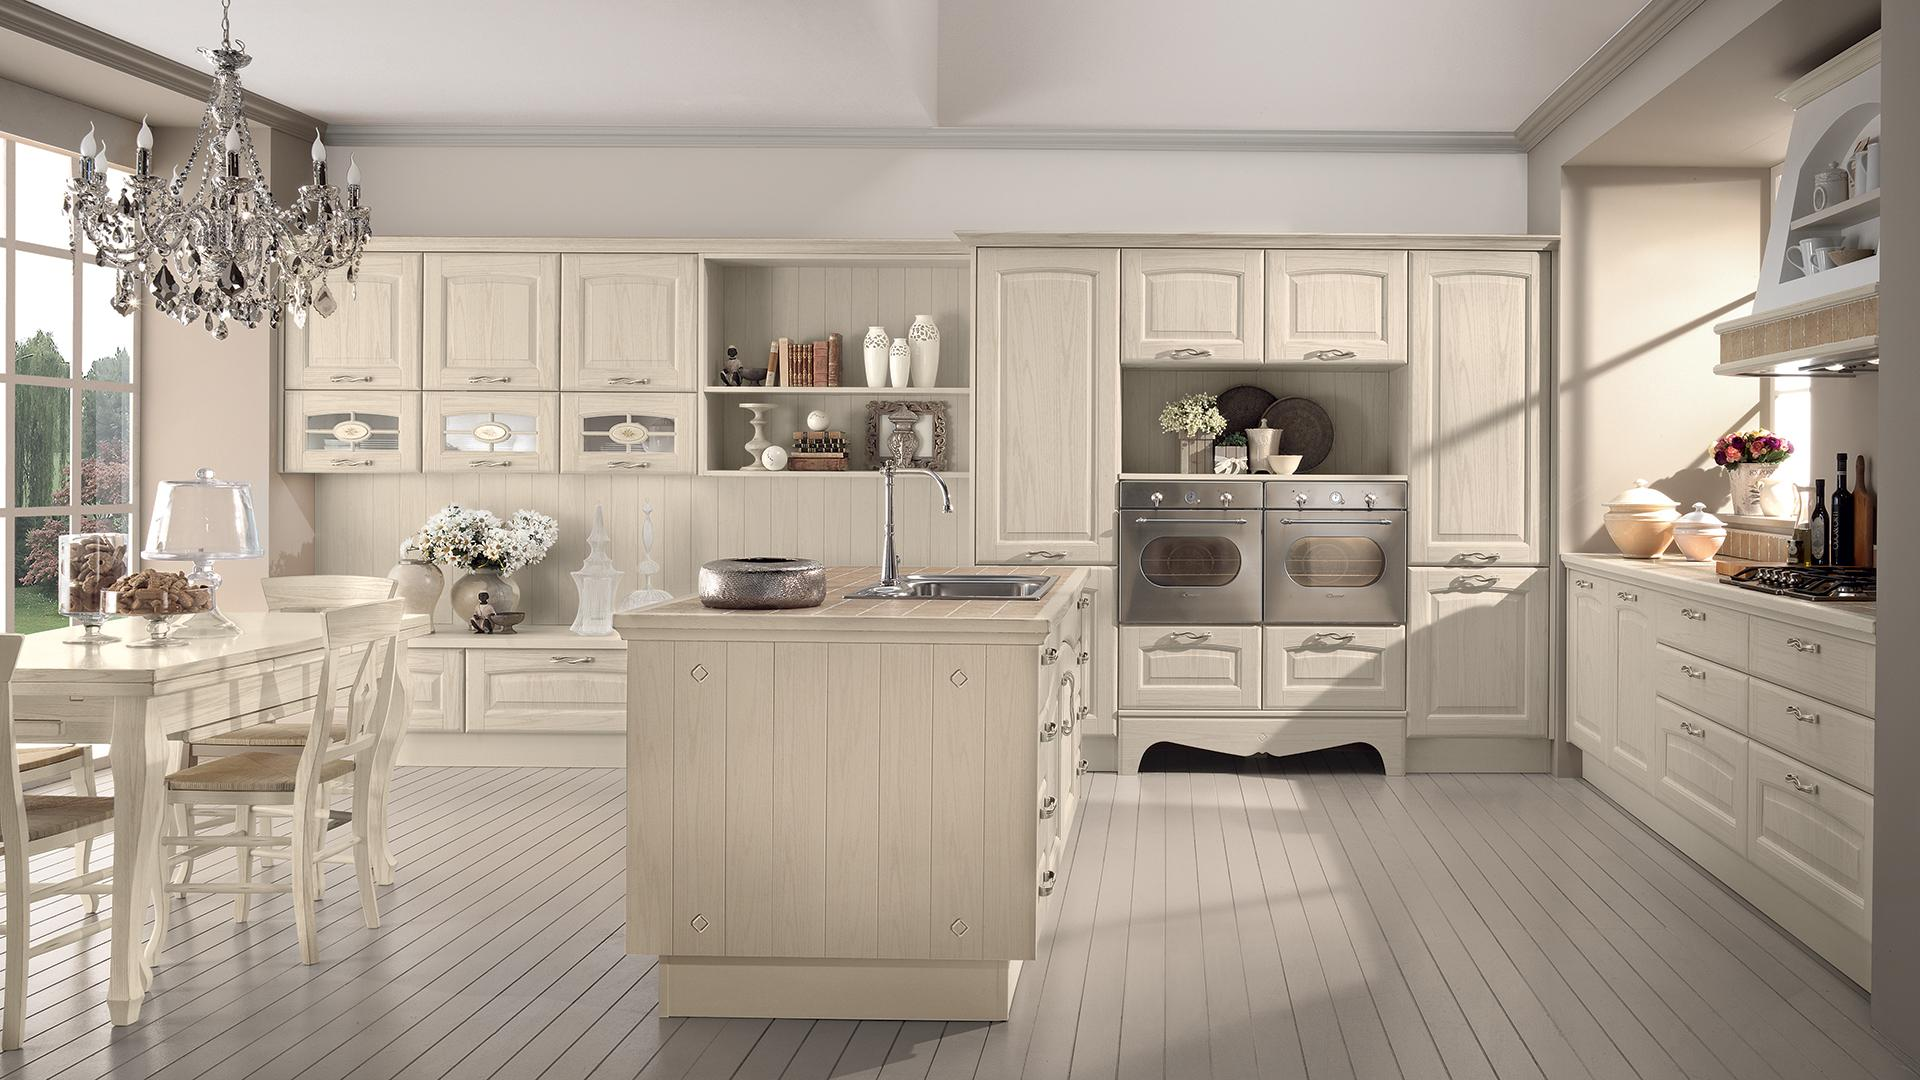 Cucina rustica, le soluzioni classiche di Lube Store per ...